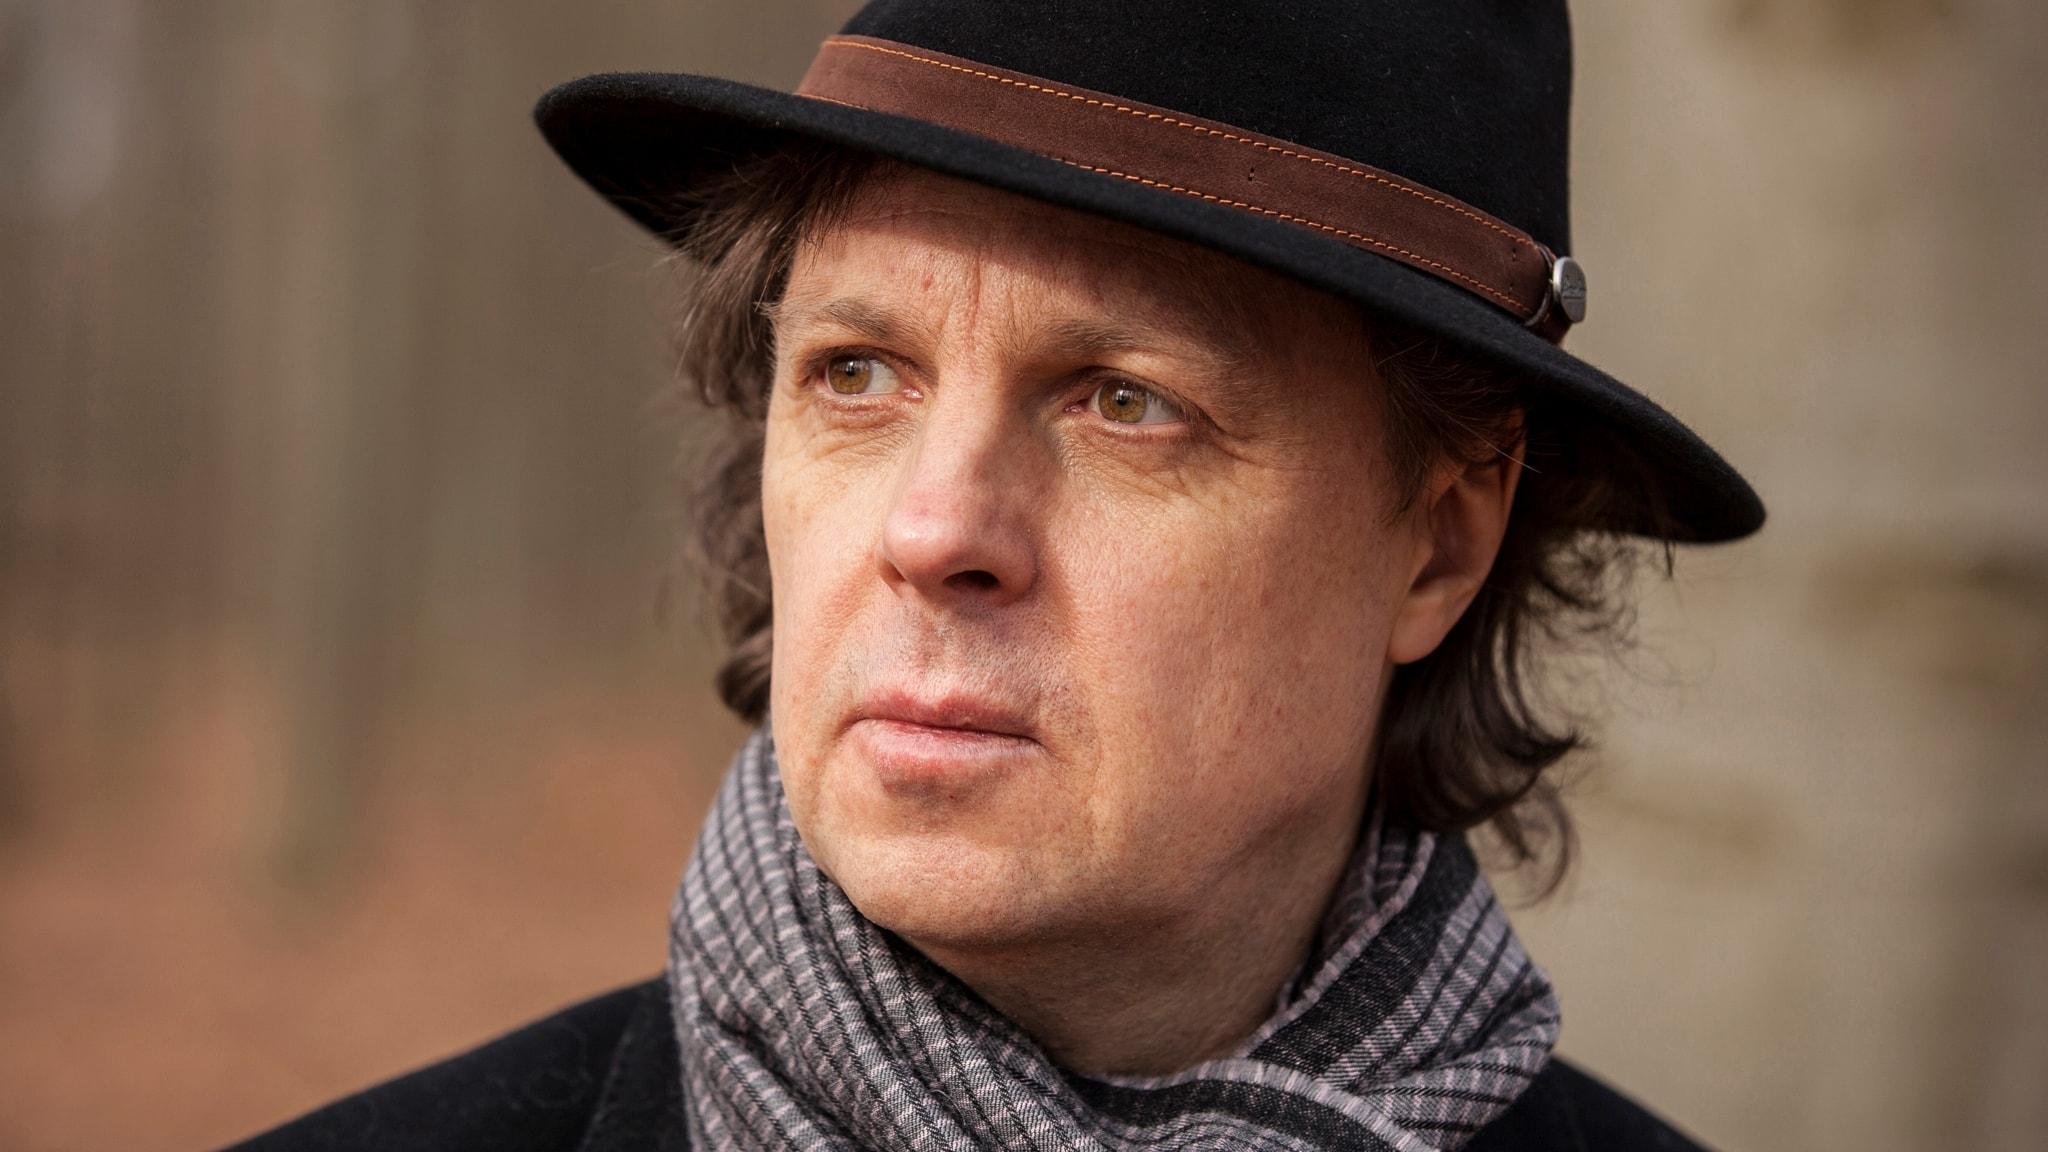 KONSERT: Frossa i Tommie Haglund